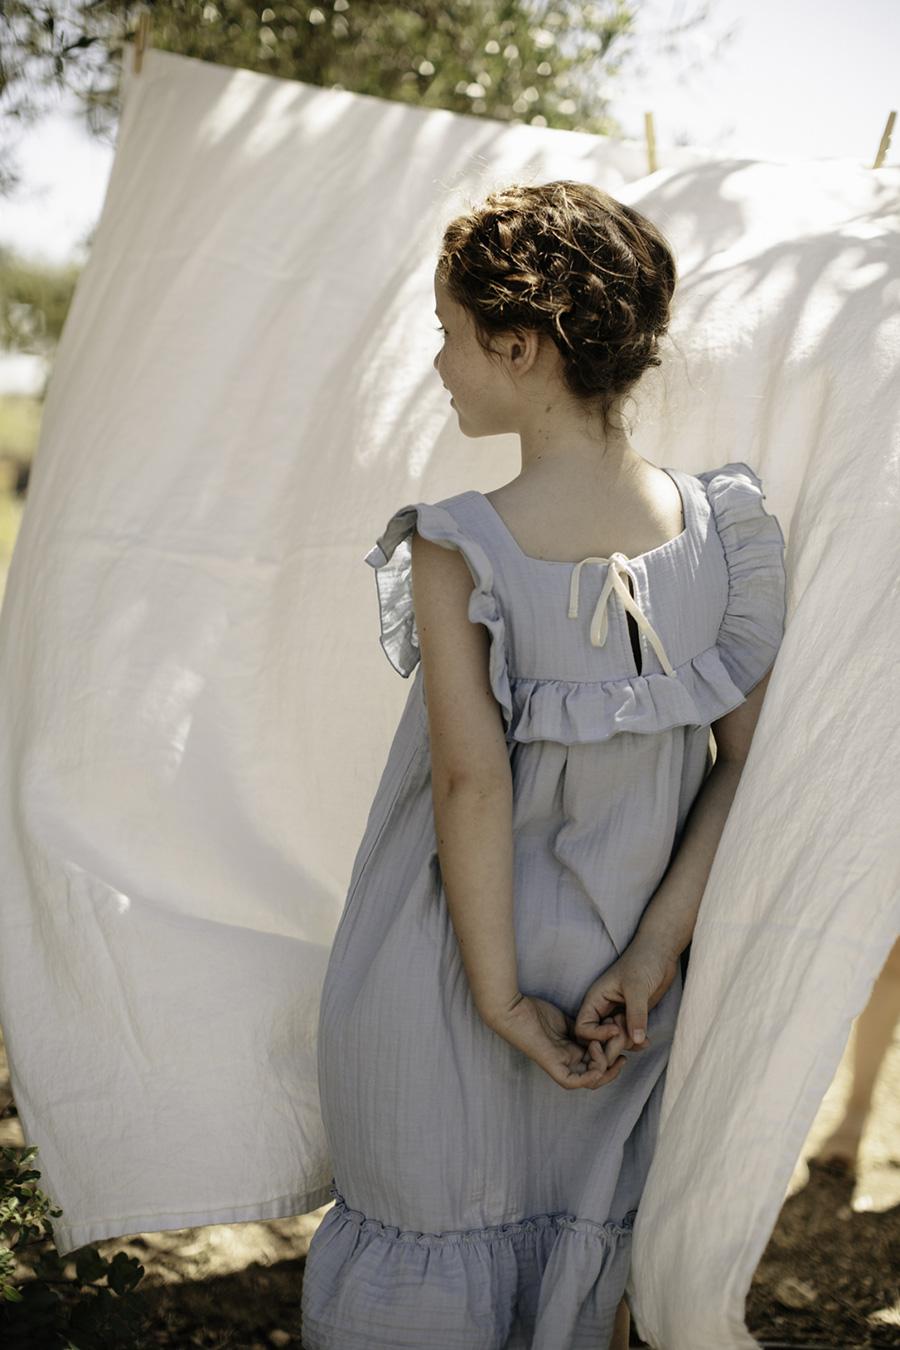 [30%OFF] From germany liilu Lina dress -/-/4-6Y Sandy stripesORGANICCOTTON